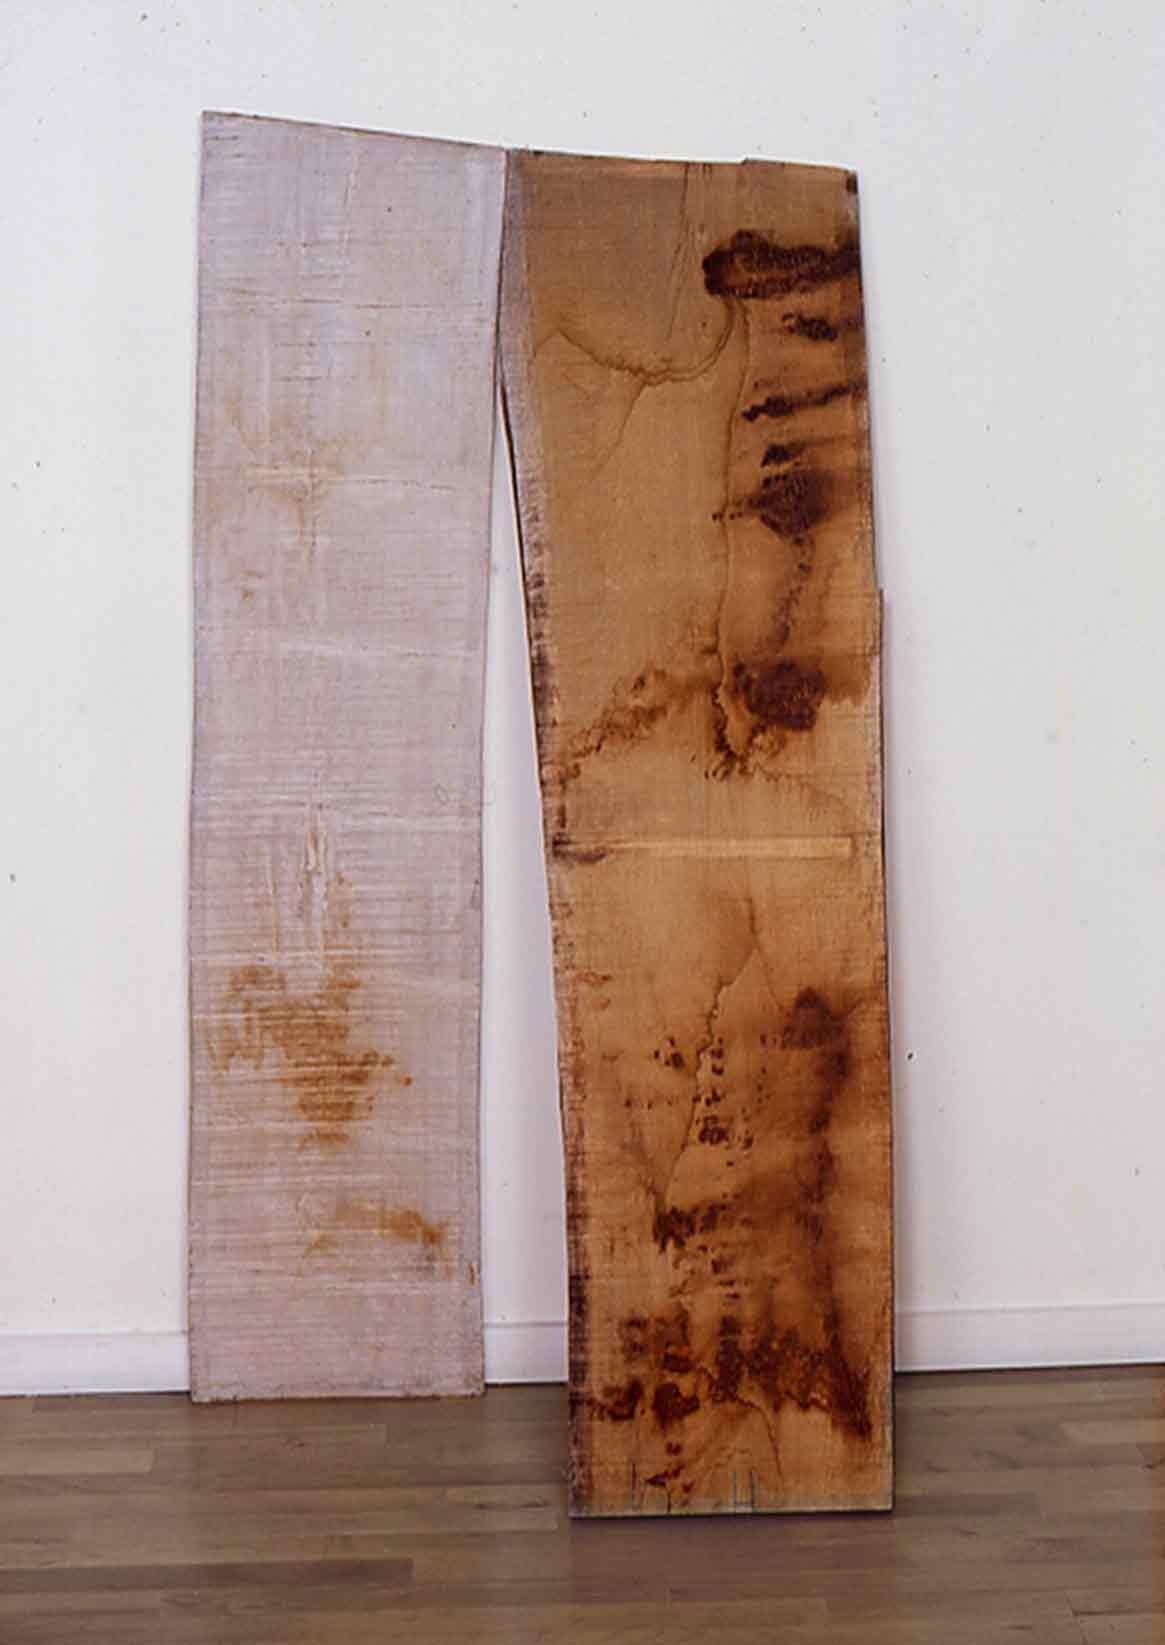 Sculpture bandée - 1998 – Bois, tarlatane. 80 x 88160 x 20cm. Denis Falgoux